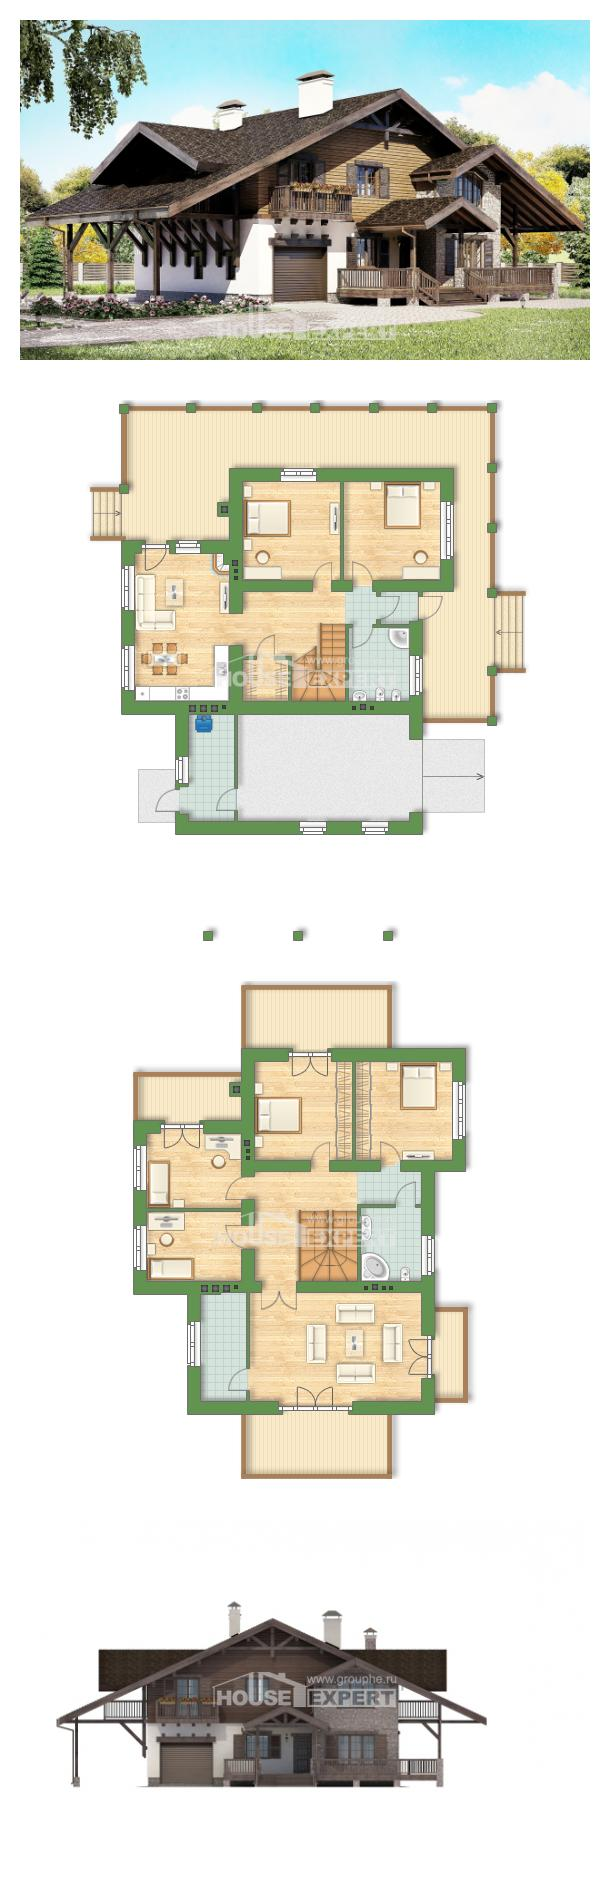 Проект дома 270-001-Л | House Expert